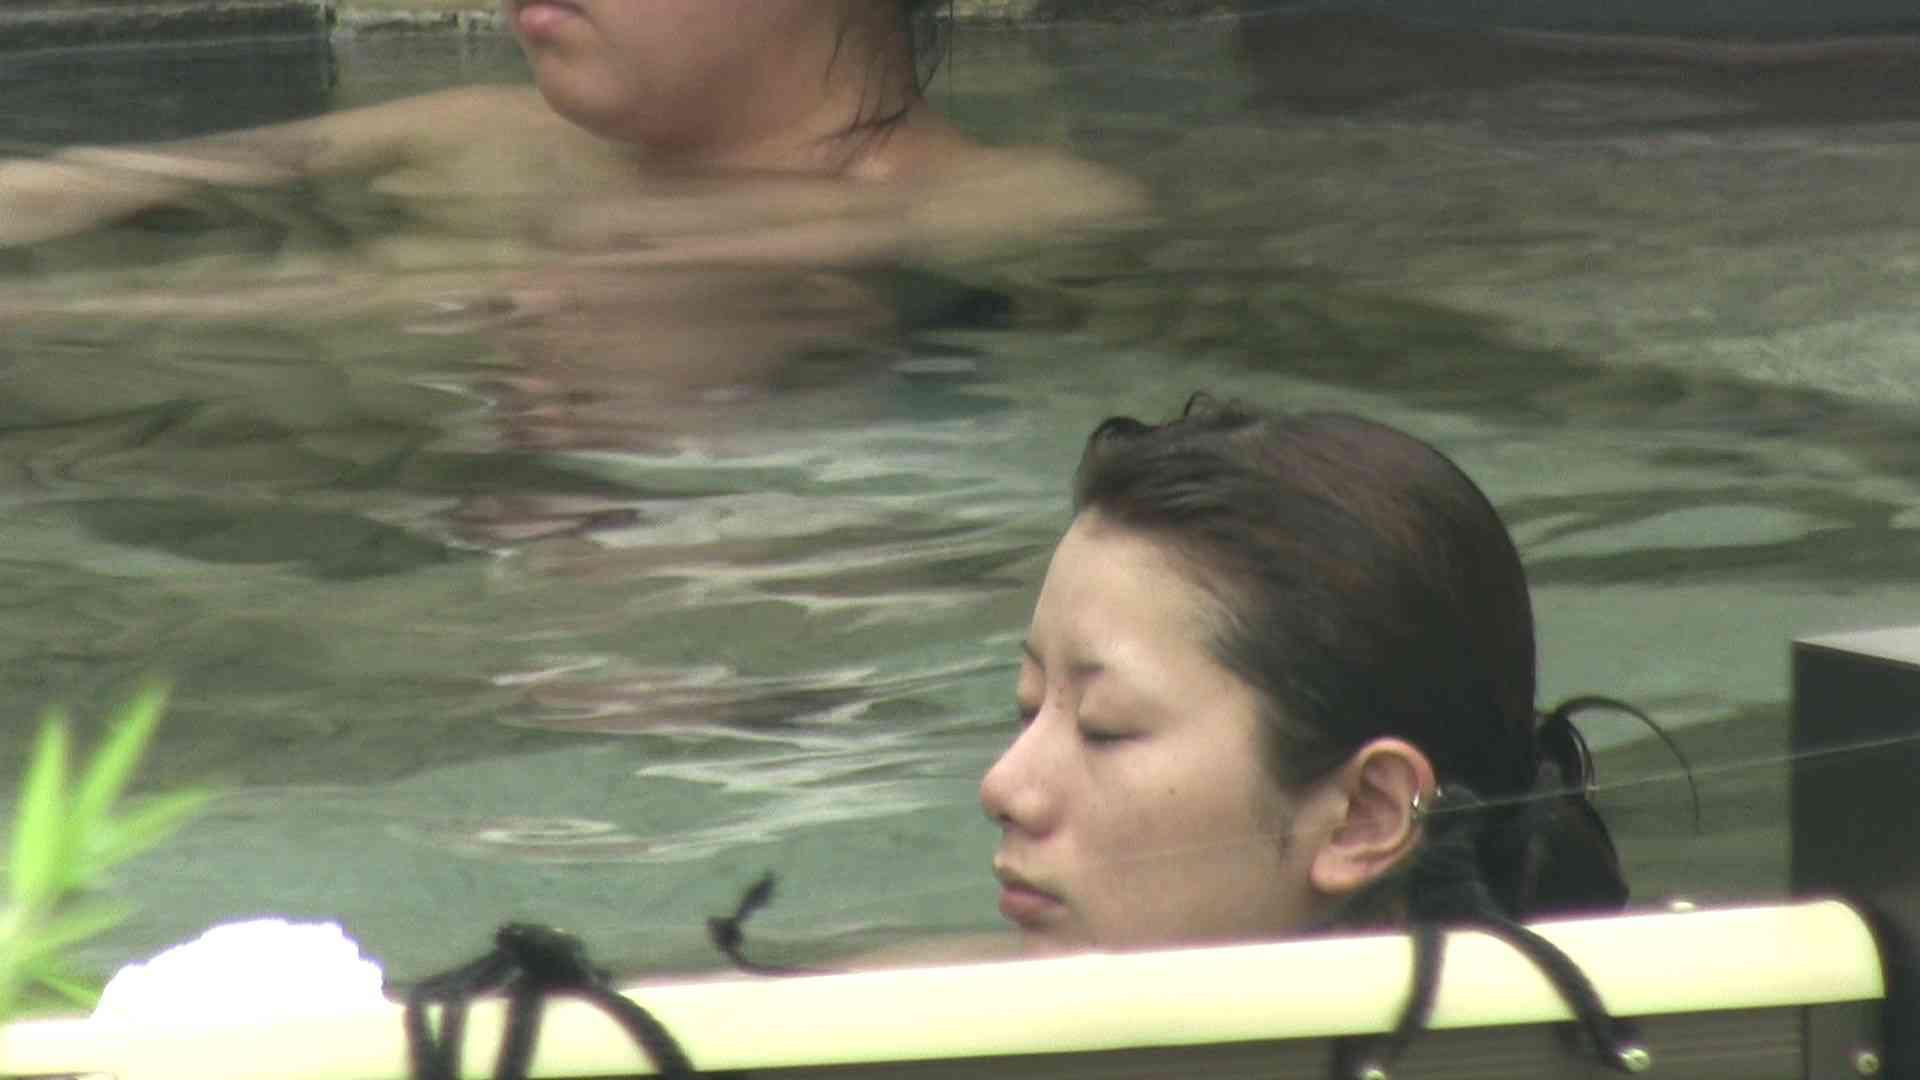 Aquaな露天風呂Vol.19【VIP】 盗撮 | HなOL  88pic 54